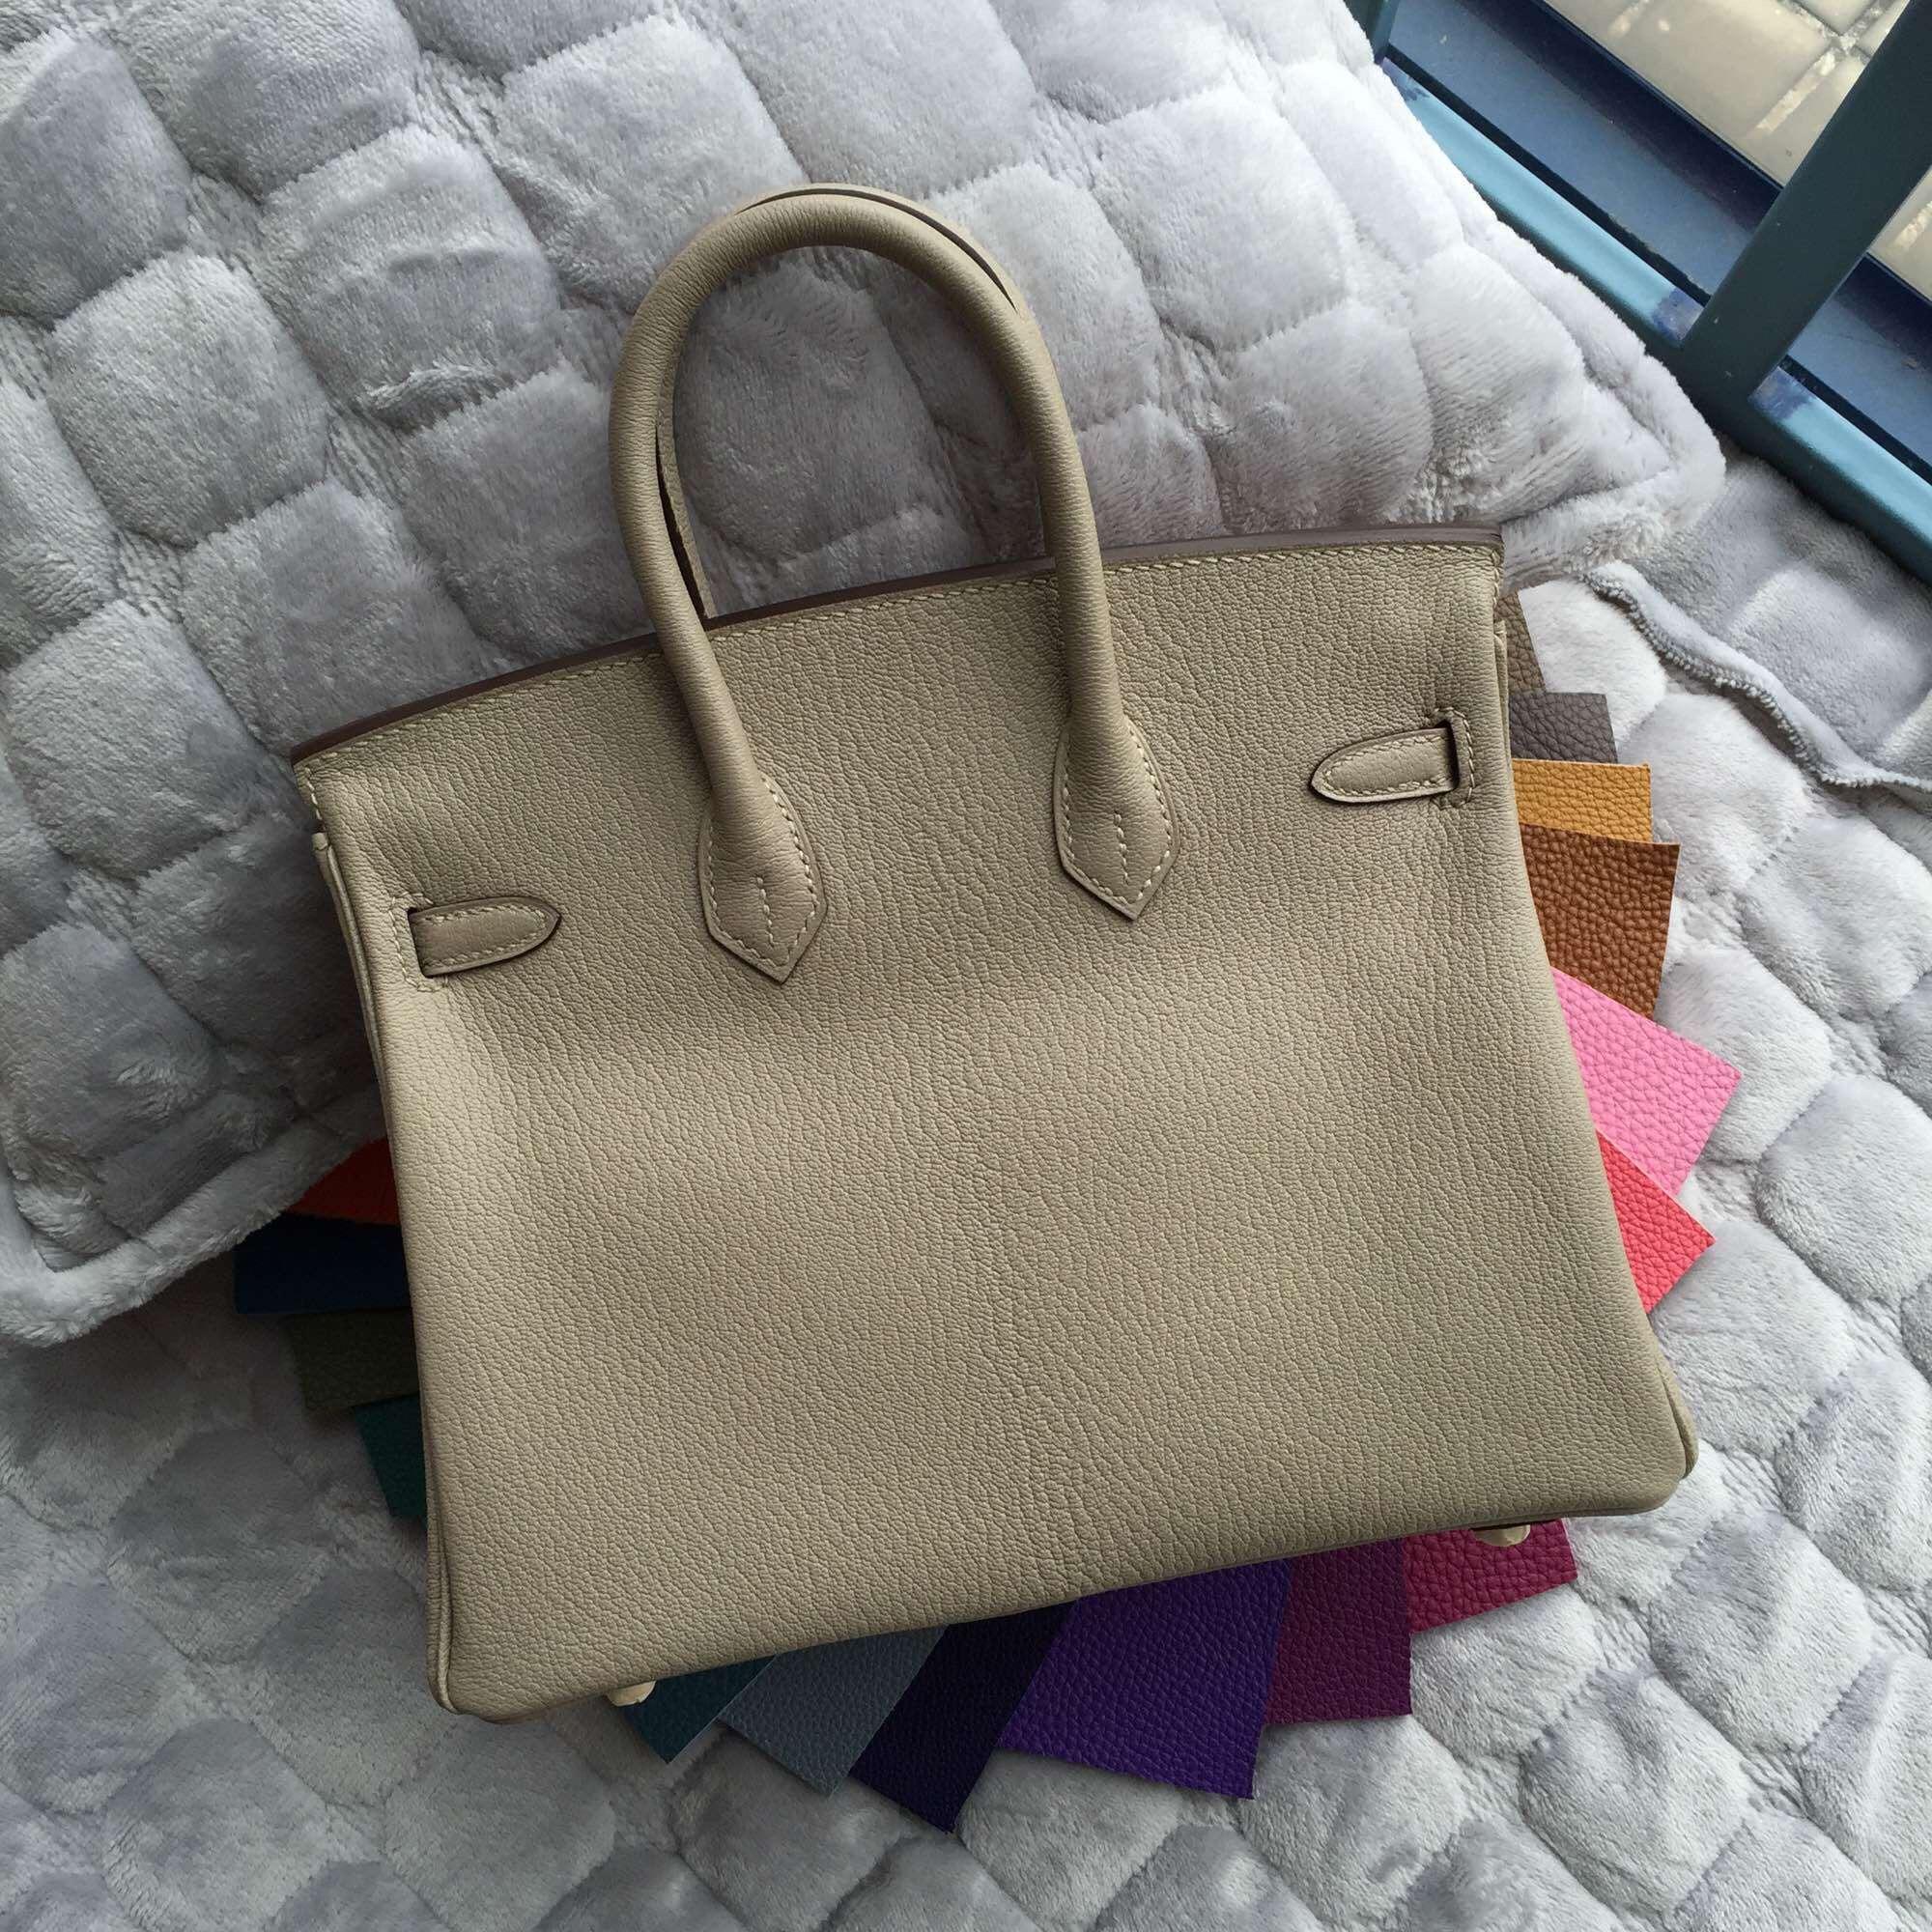 Hermes Birkin 25CM in Gris Tourterelle Chevre Leather Tote Bag Gold Hardware